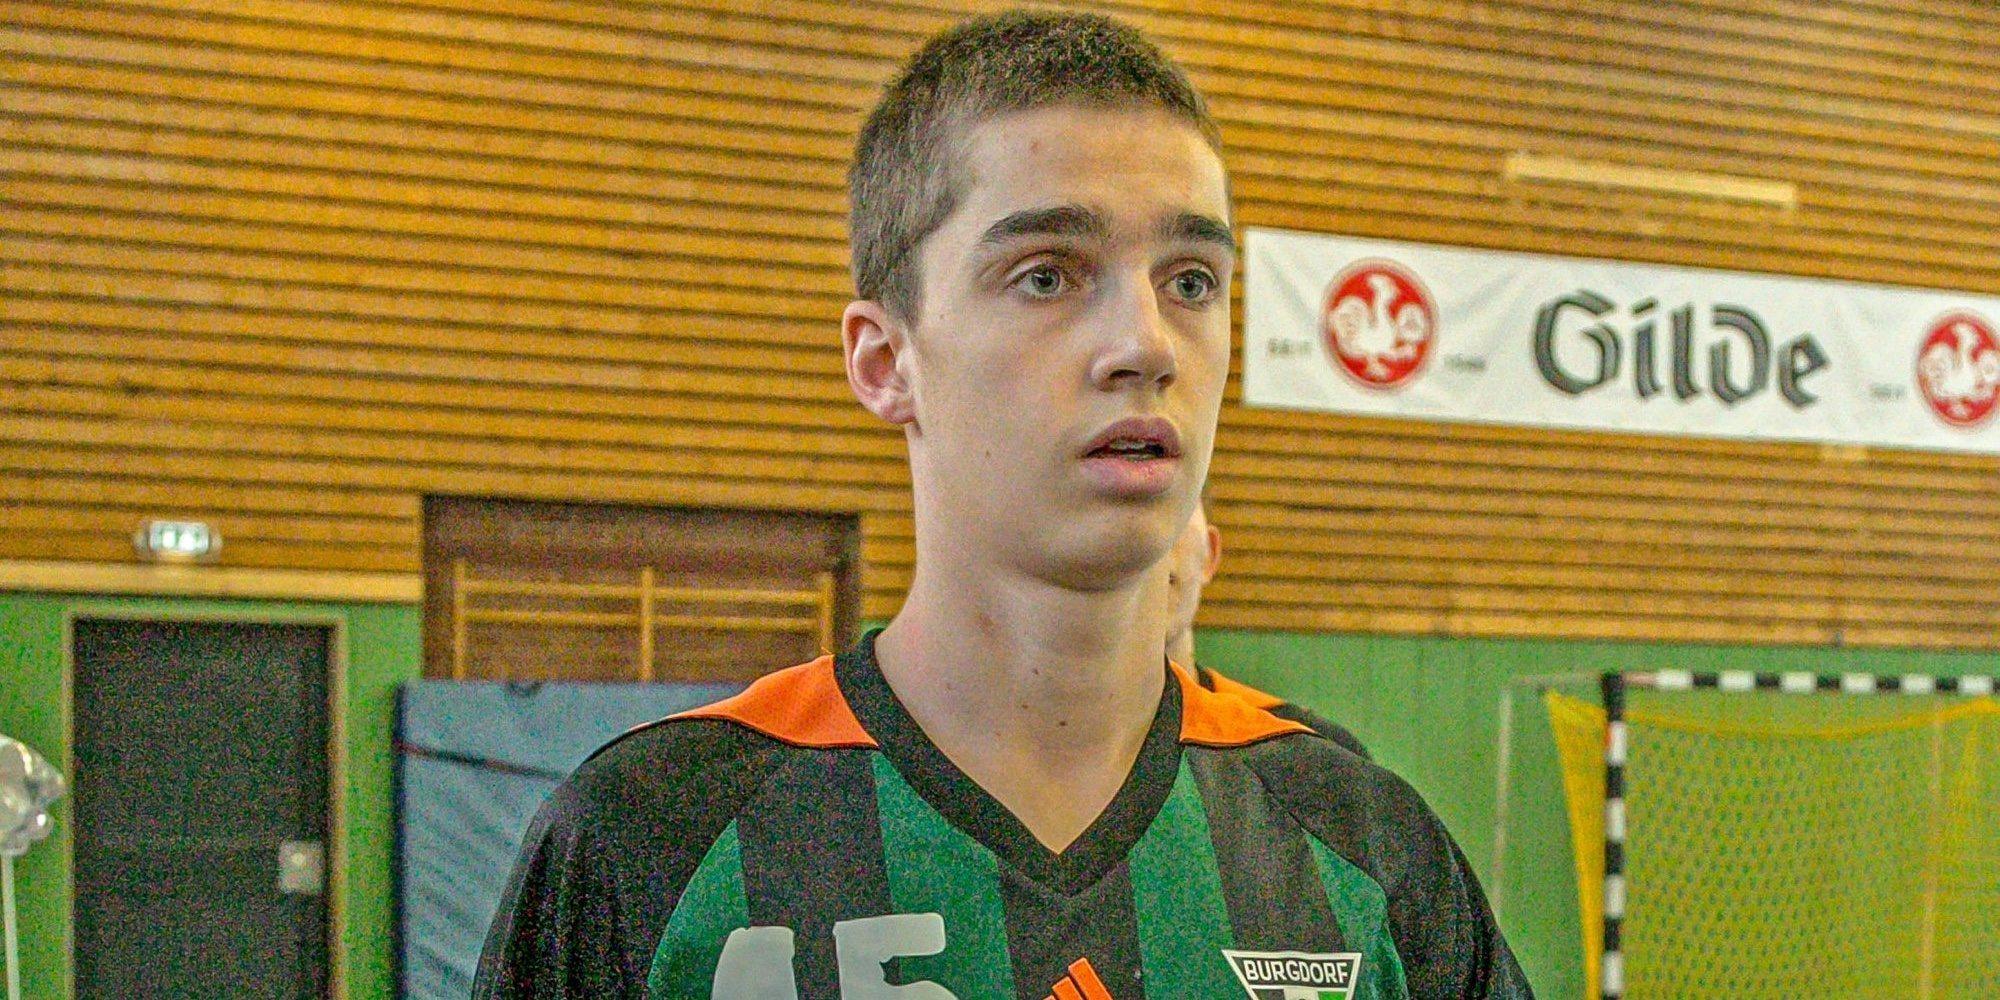 Pablo Urdangarin sorprende como tiktoker